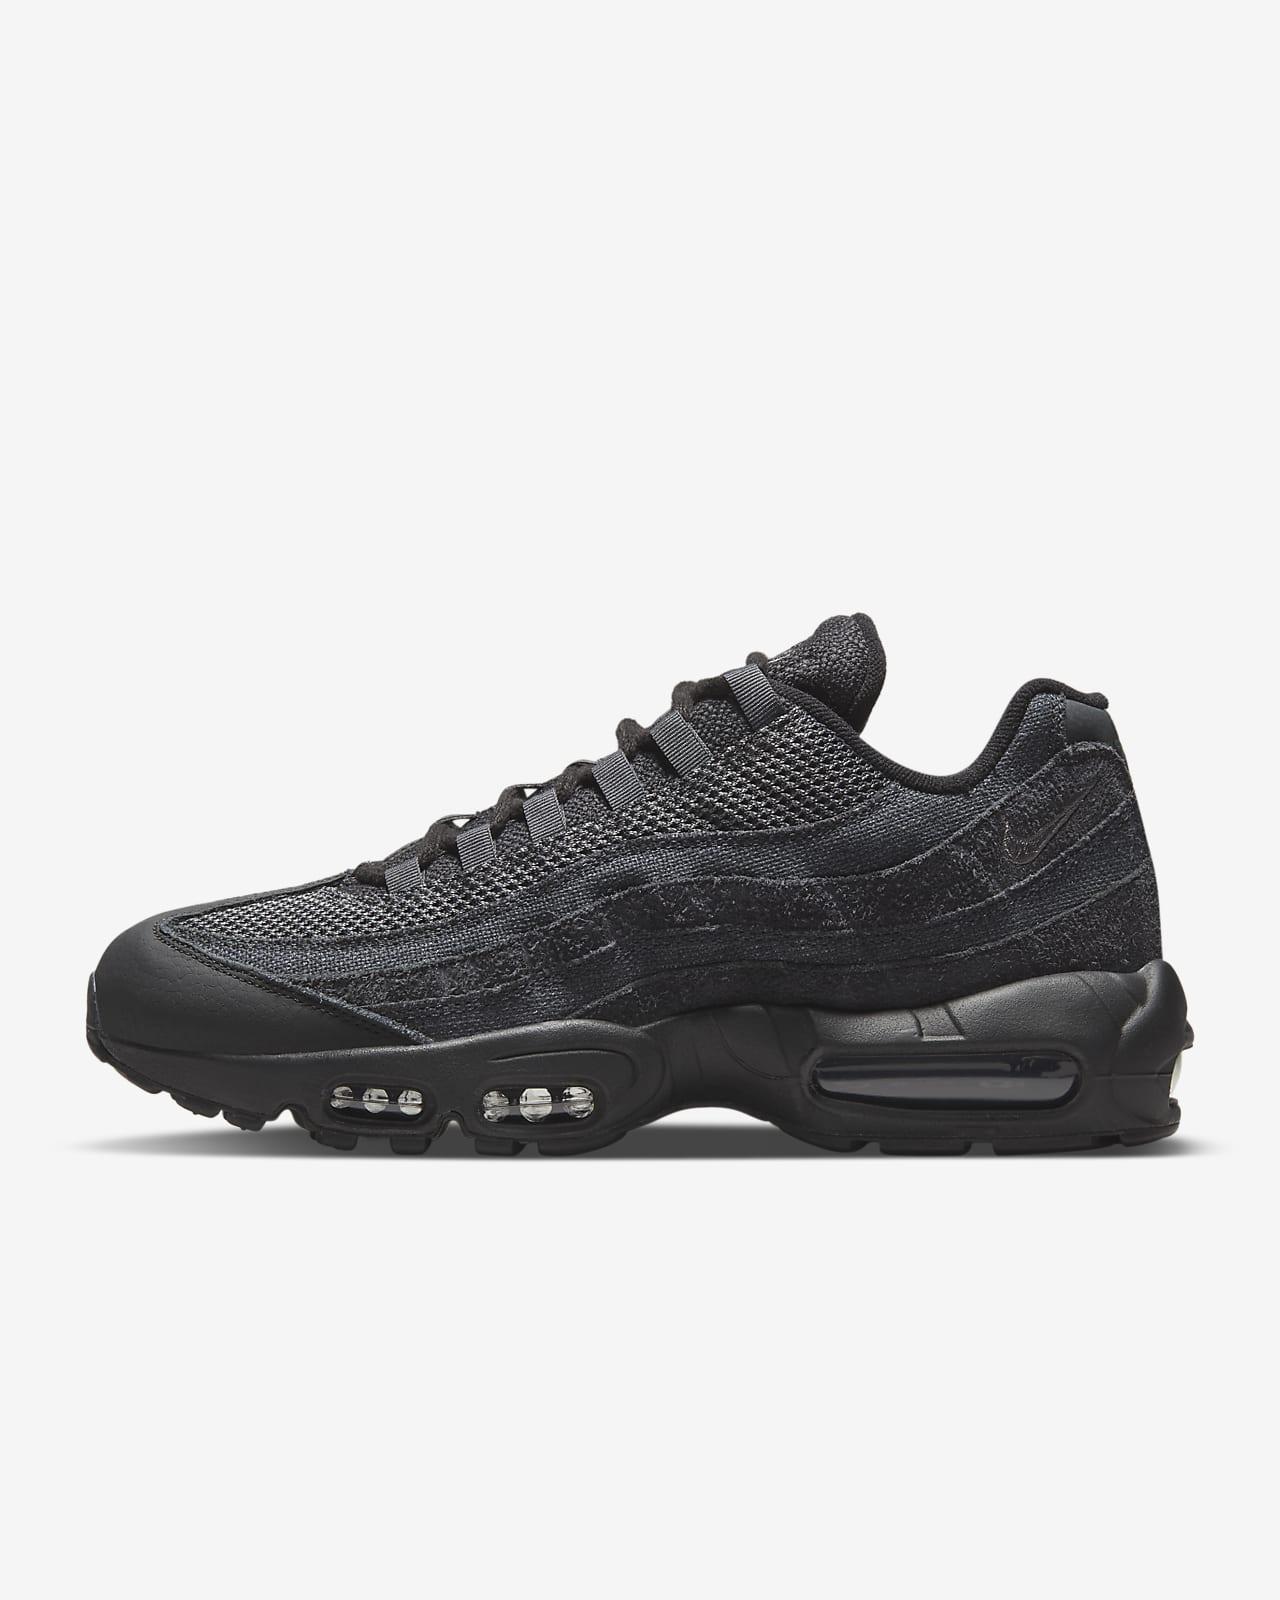 Nike Air Max 95 OG Men's Shoe